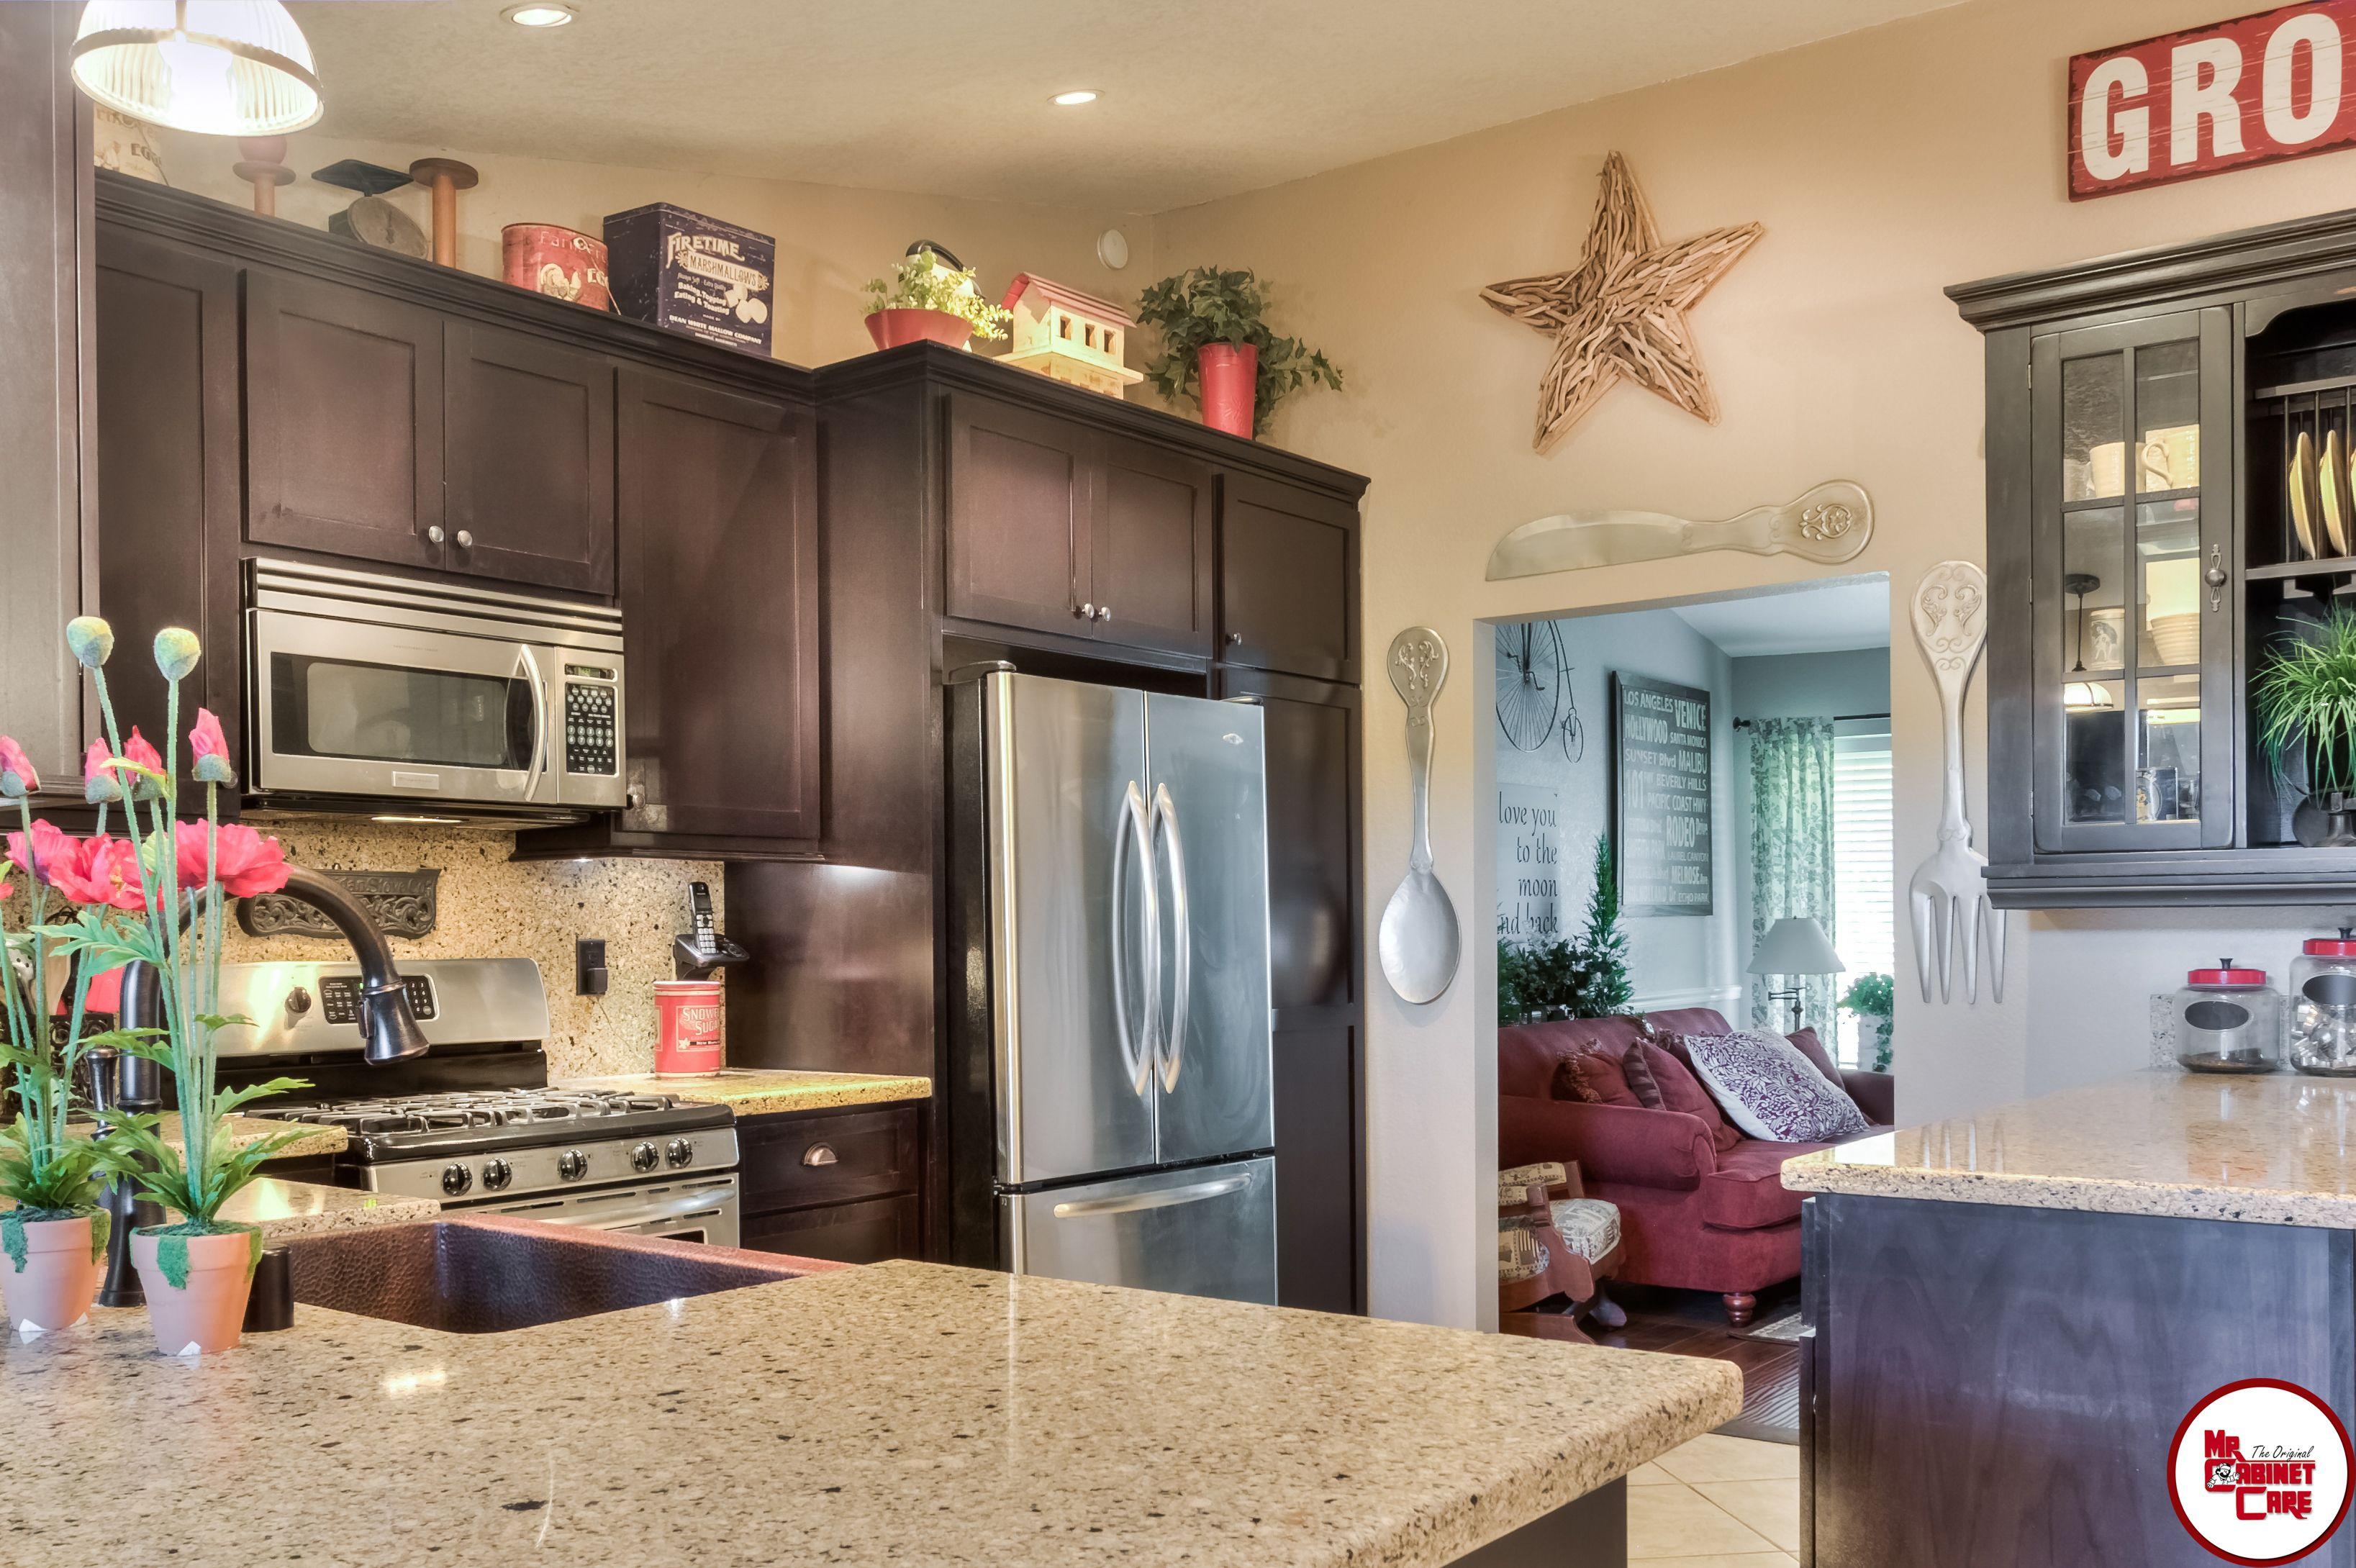 California kitchen remodeling mr care